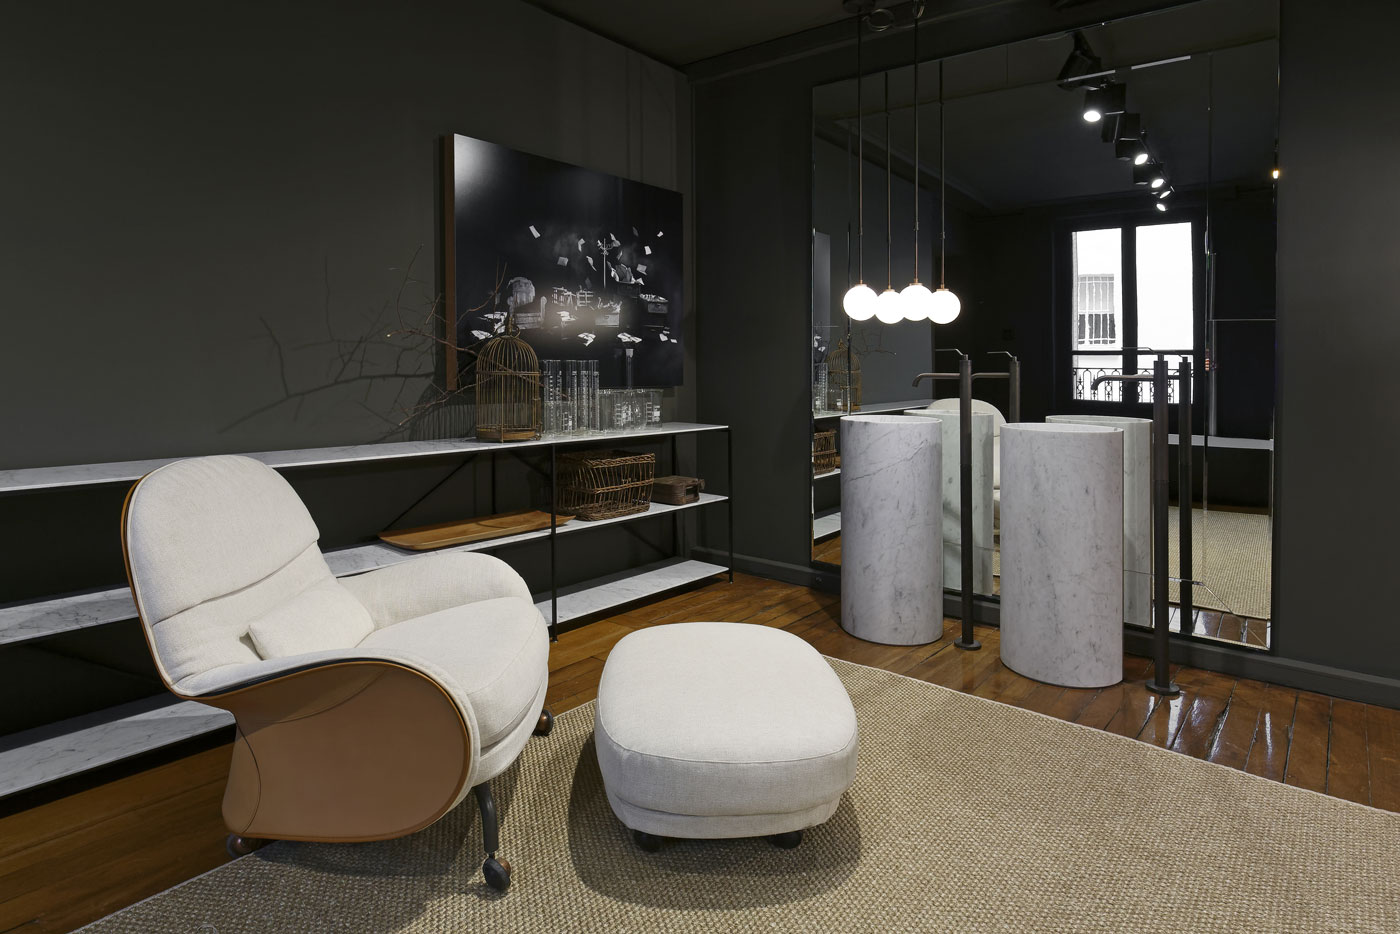 boffi de padova et ma u studio s 39 expriment paris. Black Bedroom Furniture Sets. Home Design Ideas